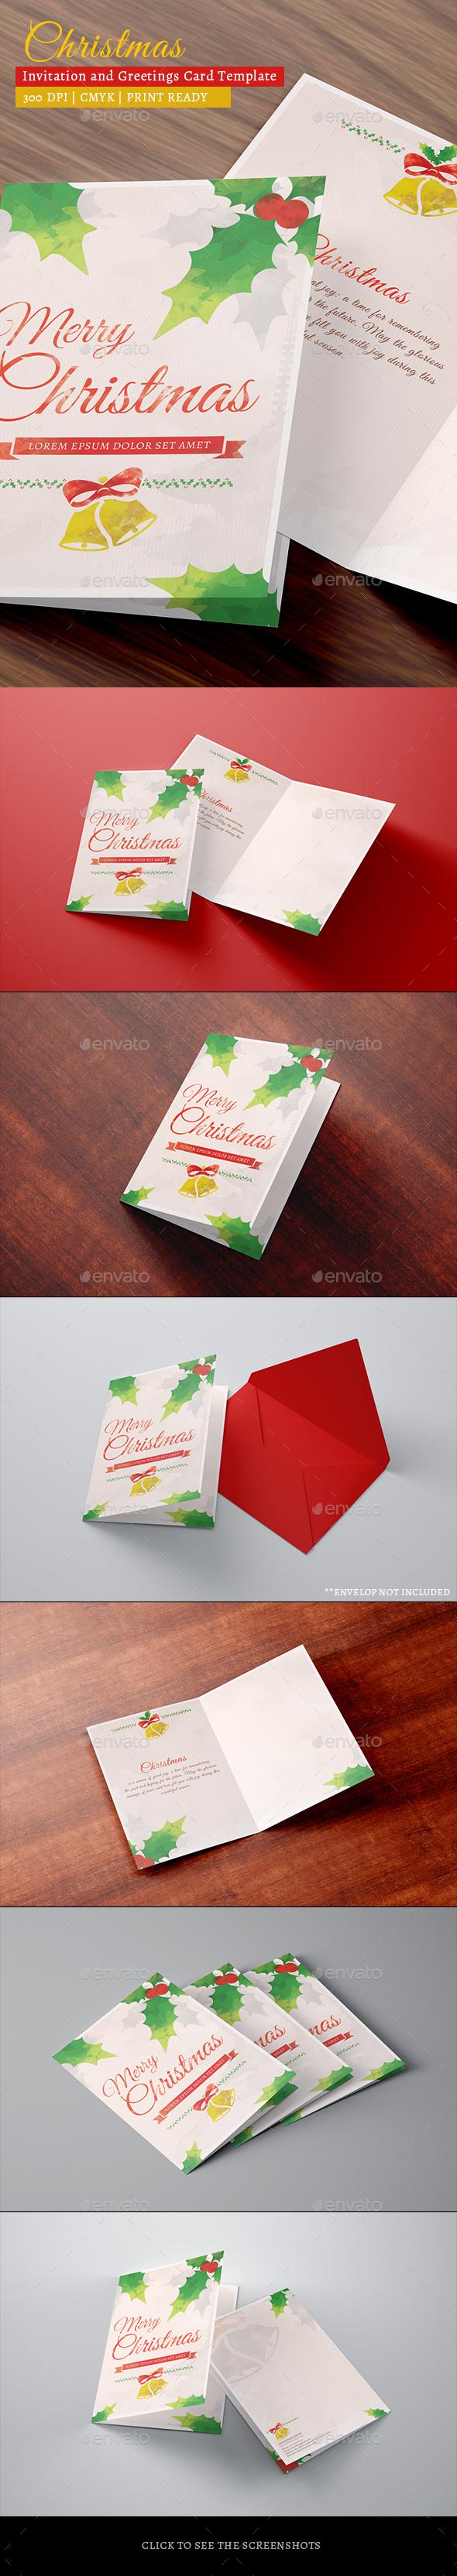 Christmas Celebration Greetings/Invitation Card - Invitations Cards & Invites